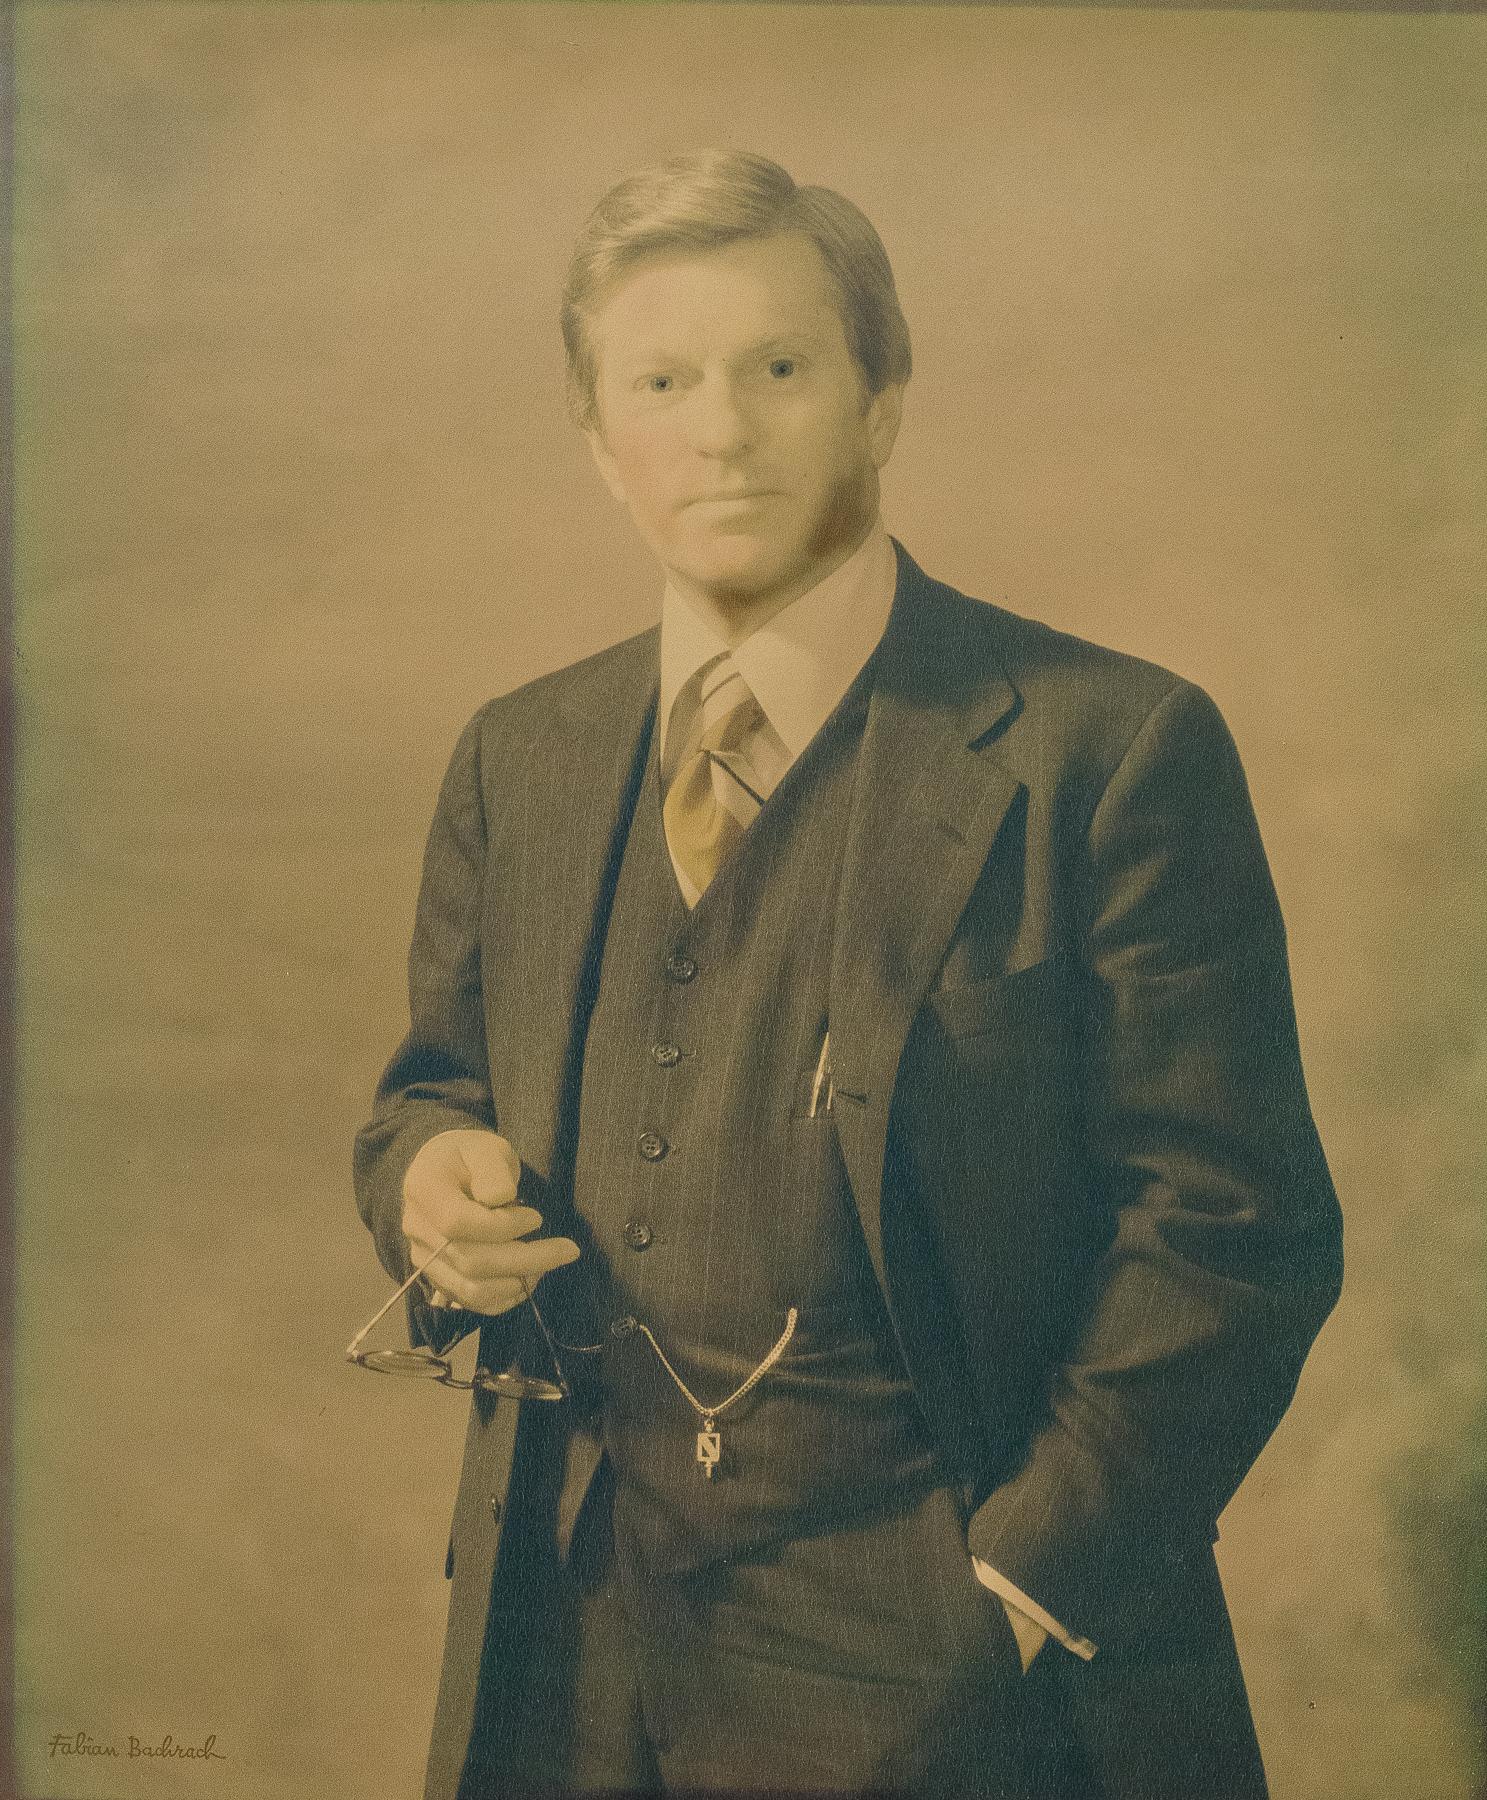 Robert O. Harvey. Dean 1963-1974.